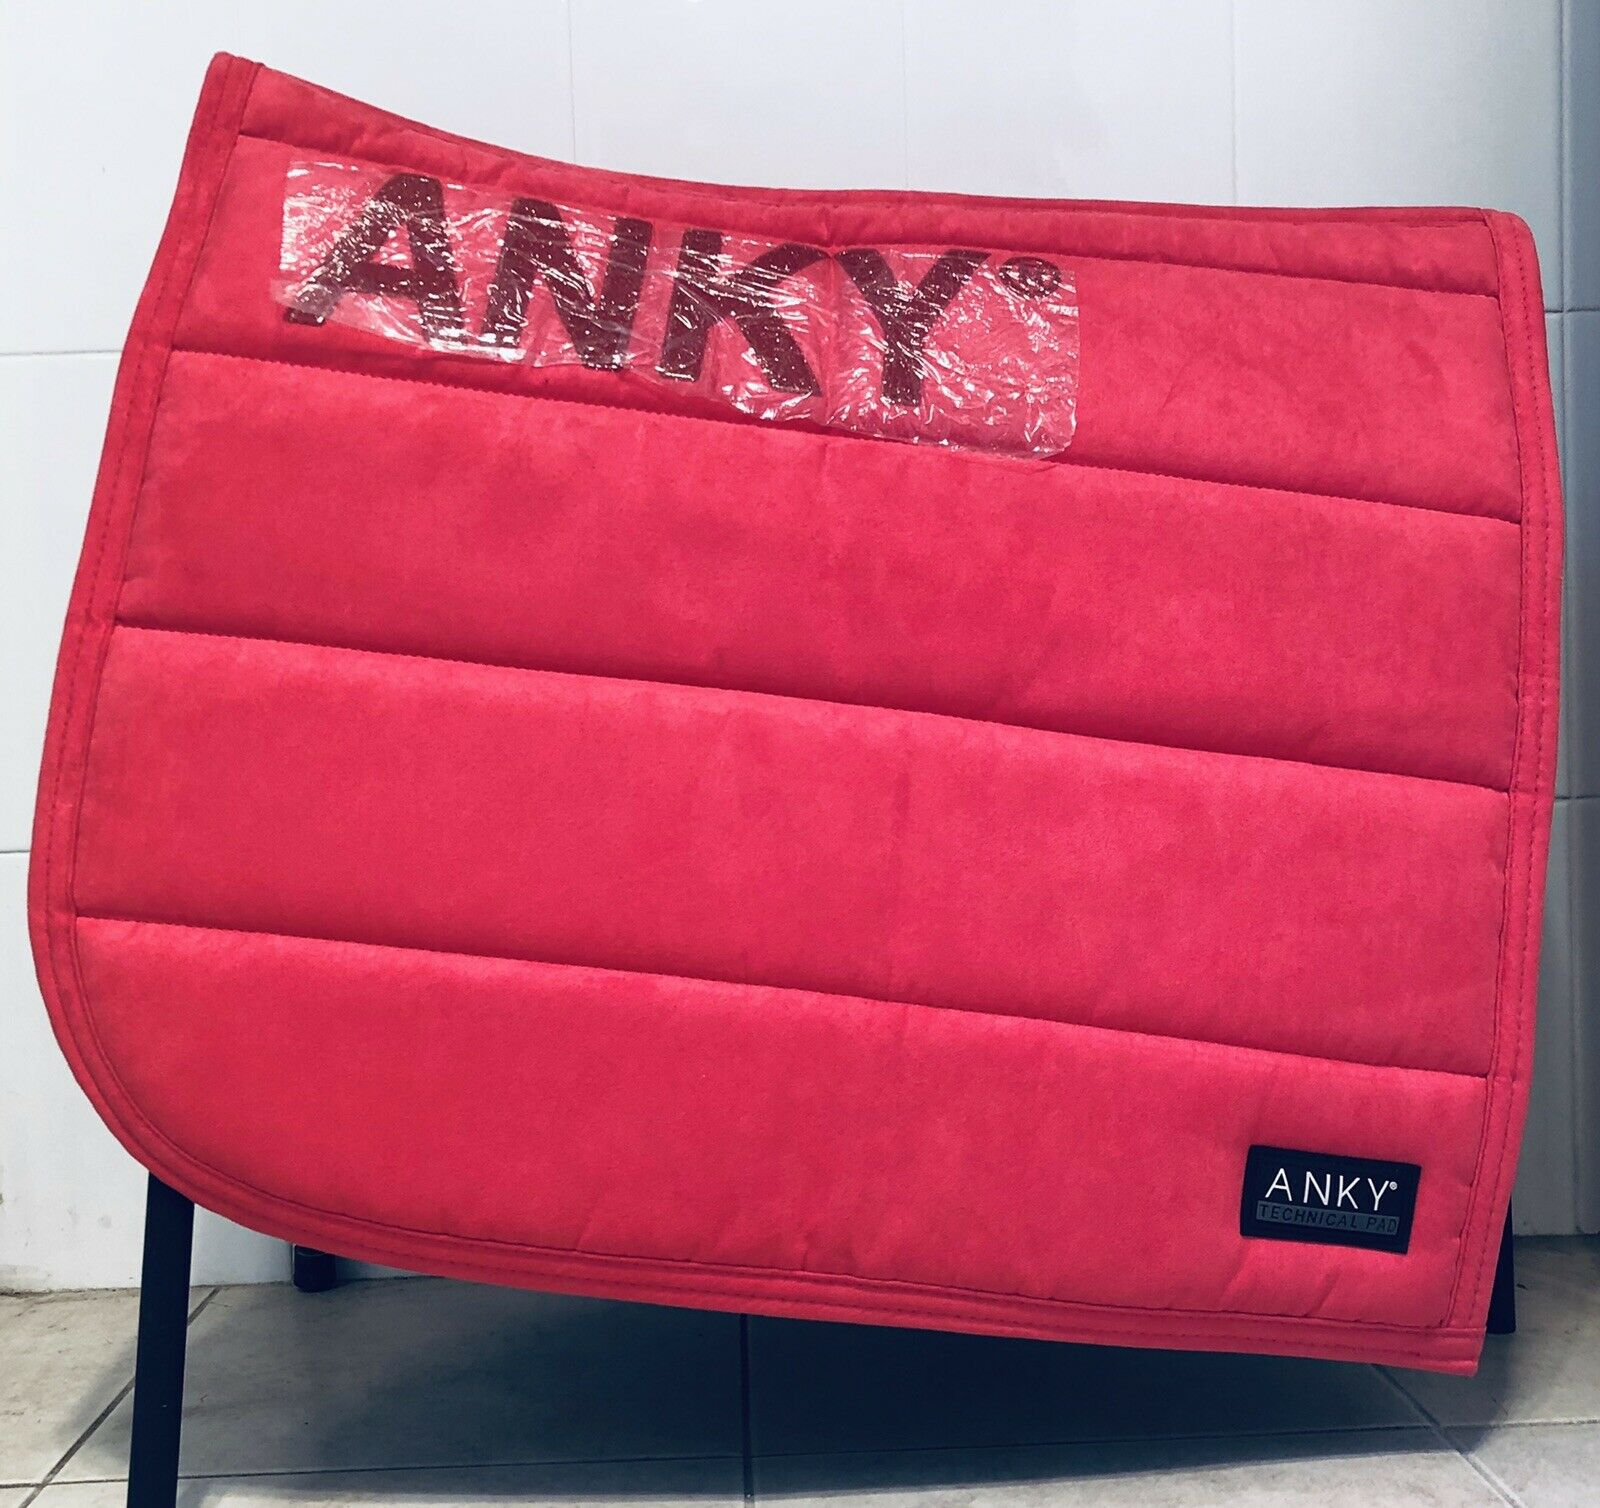 ANKY Raspberry Saddle Pad Brand New AU FREE POST